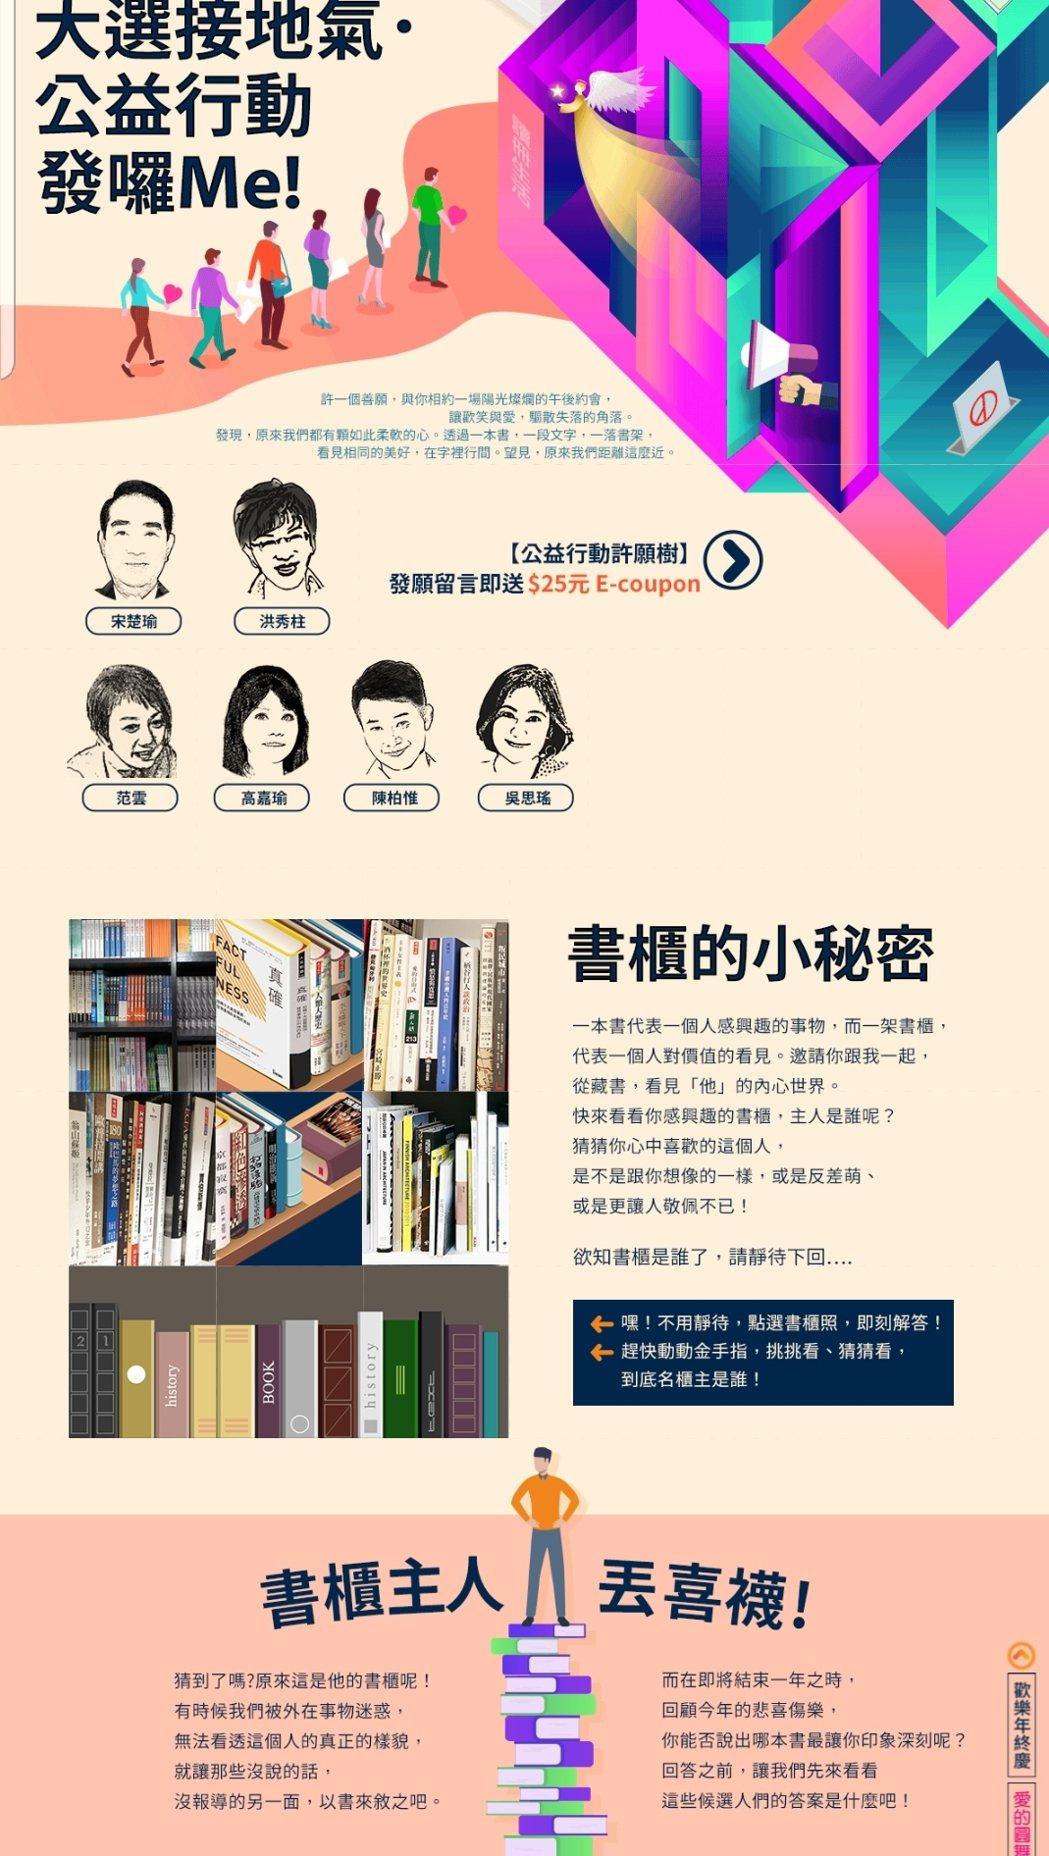 TAAZE讀冊生活網路書店邀候選人打開他們的書櫃秘密。圖片取自TAAZE讀冊生活...